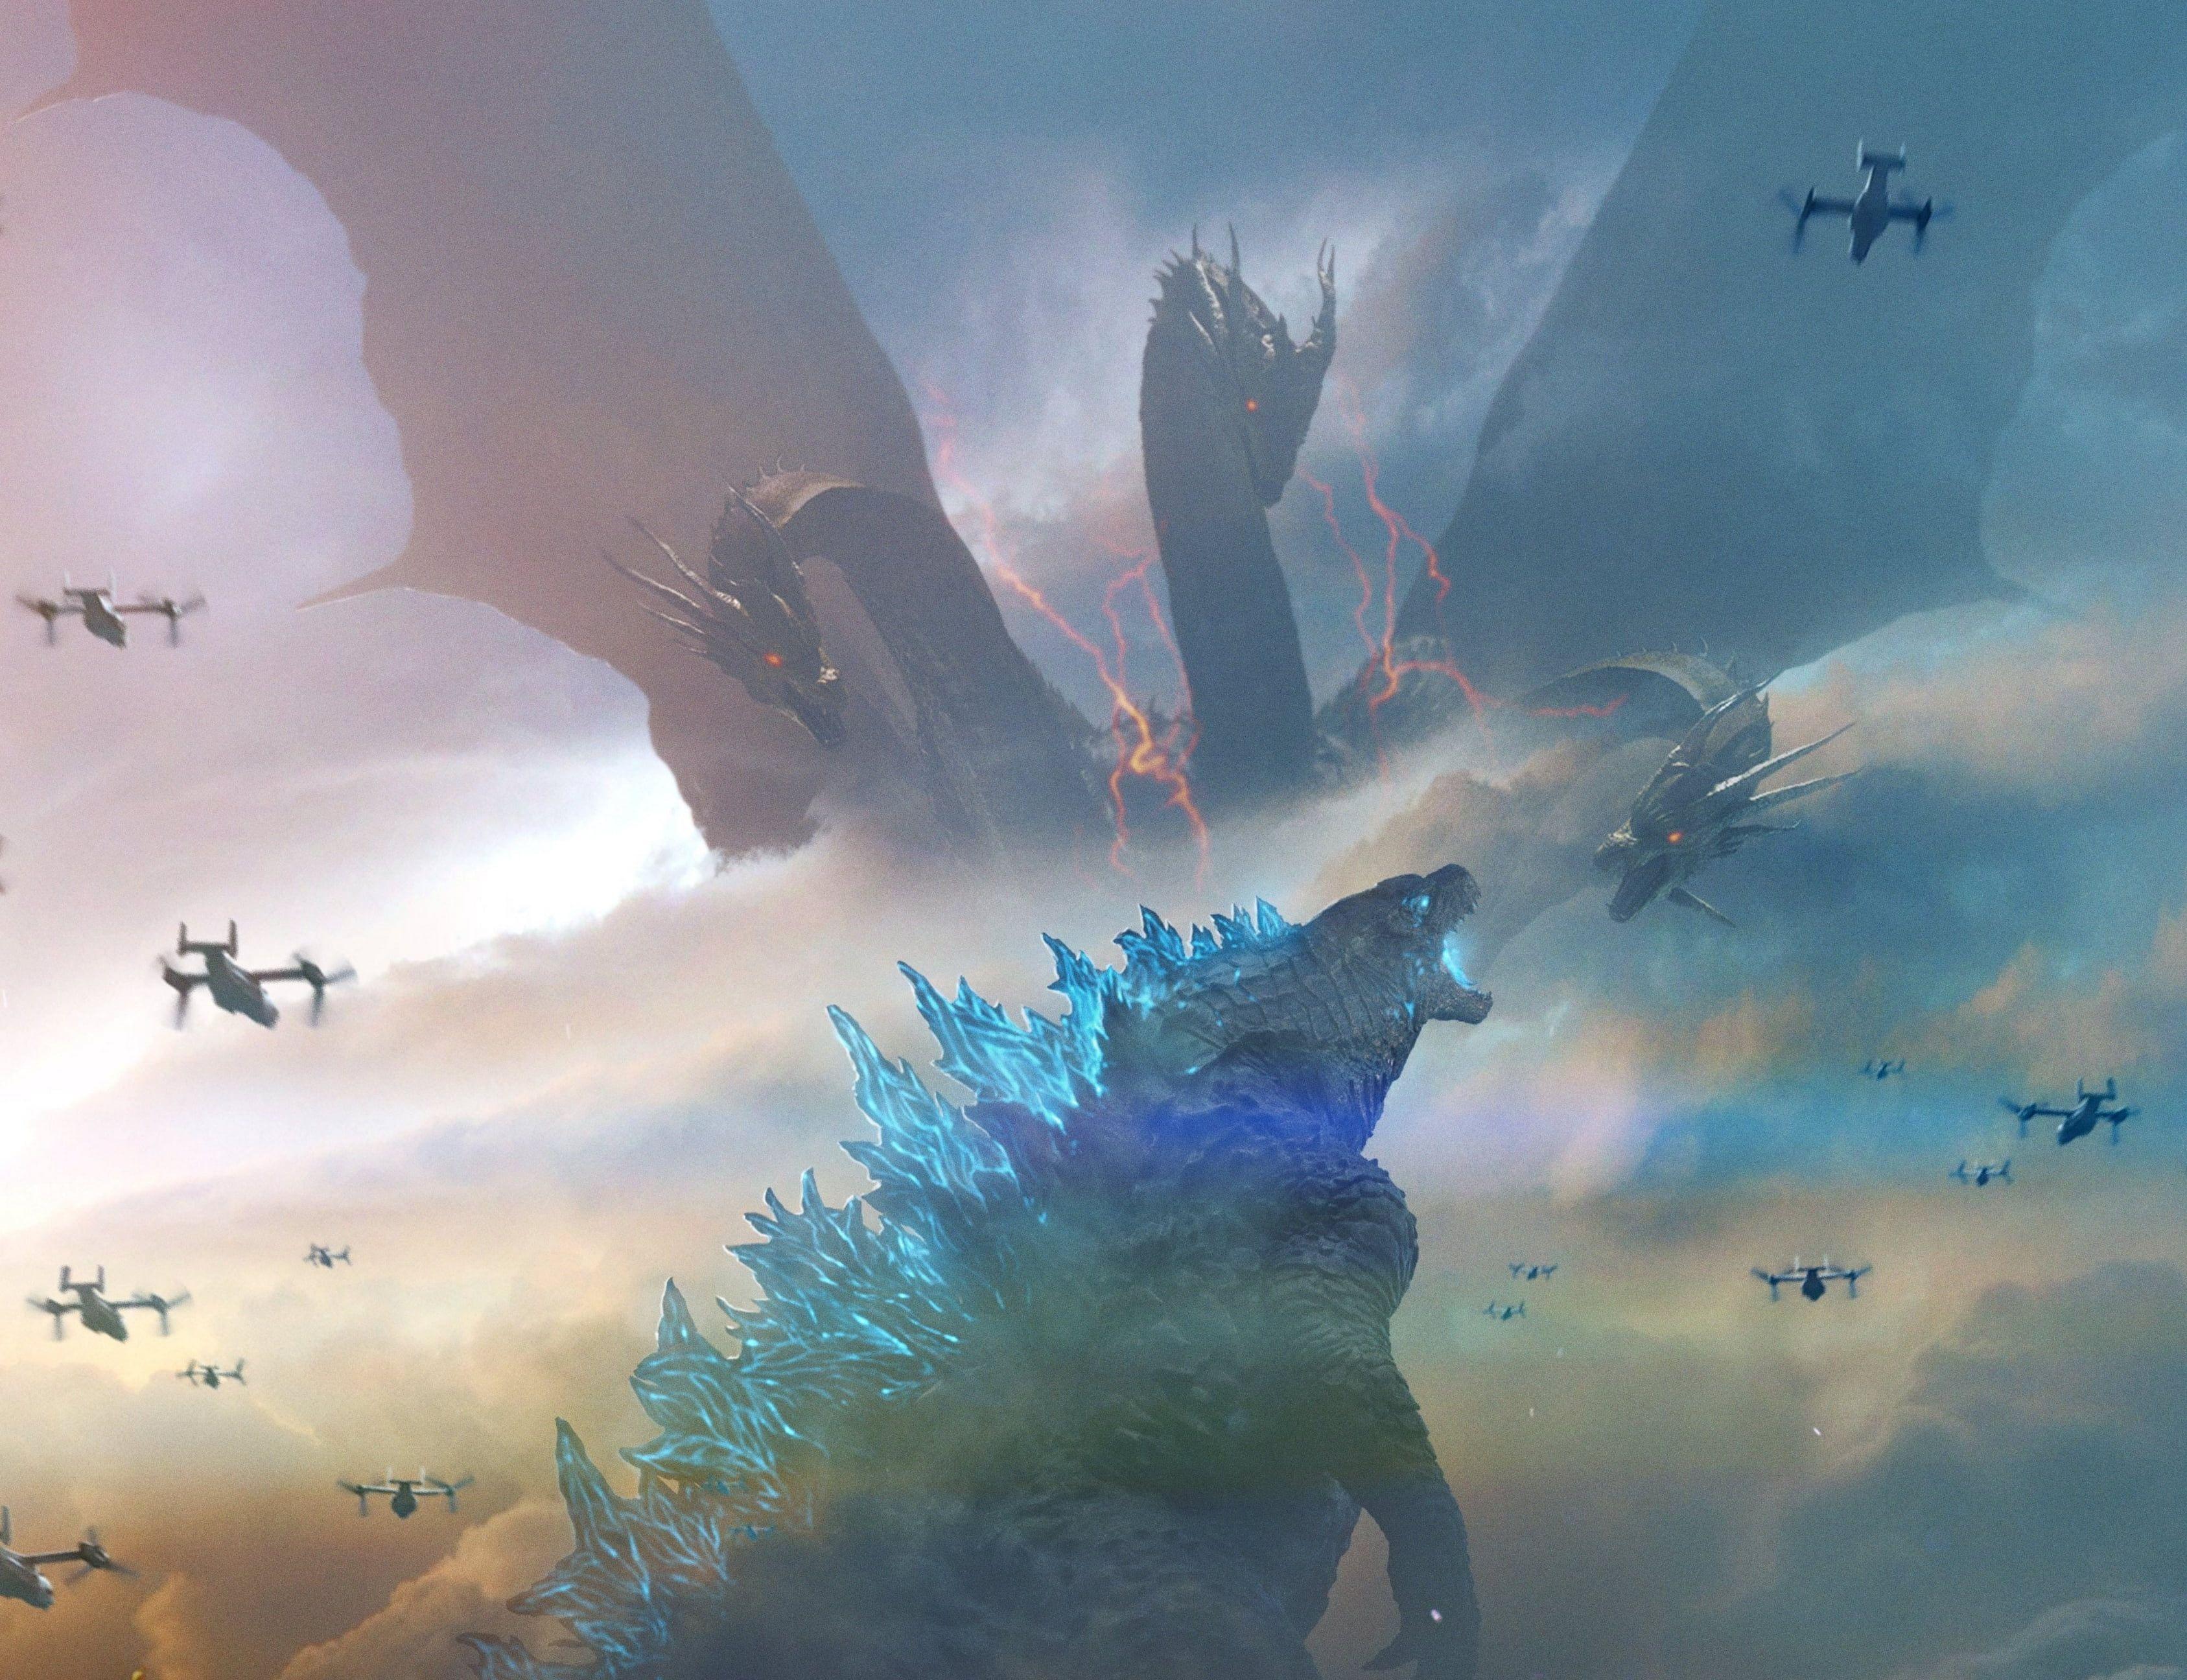 Movie Godzilla King Of The Monsters Godzilla King Ghidorah 2k Wallpaper Hdwallpaper Desktop In 2020 Godzilla Monster Movie Monsters